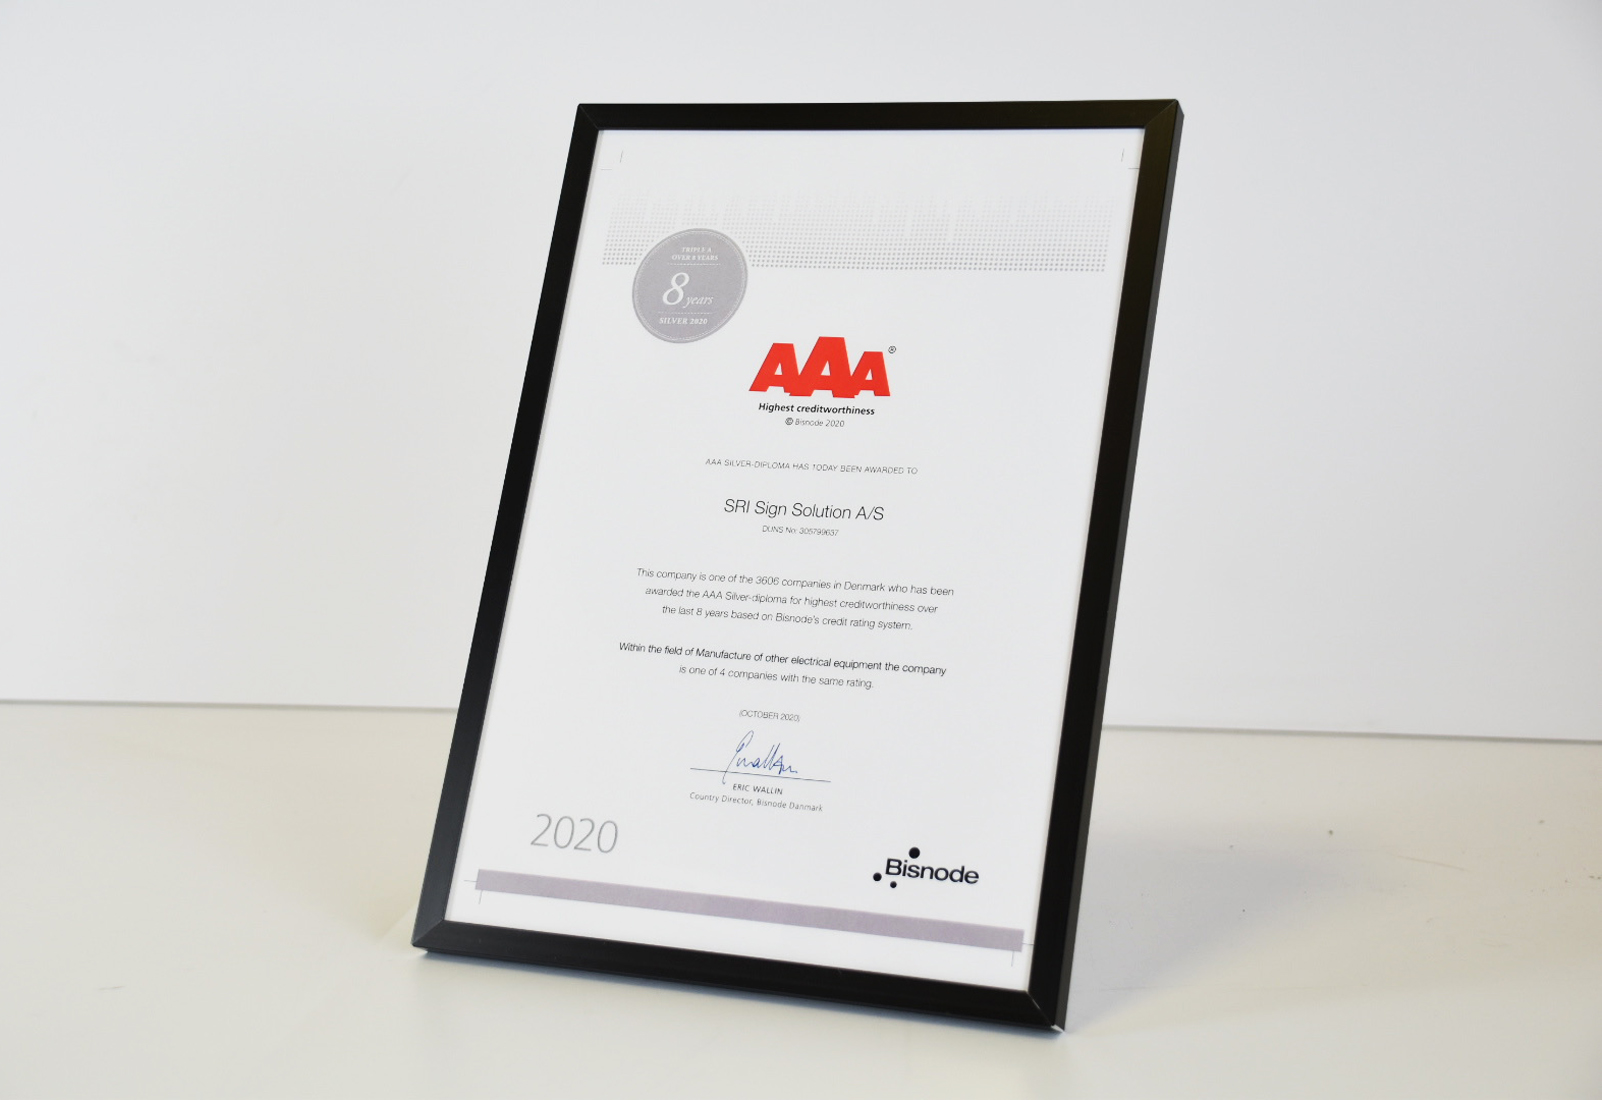 AAA diplom - 8 aar i træk - SRI Sign Solution A/S